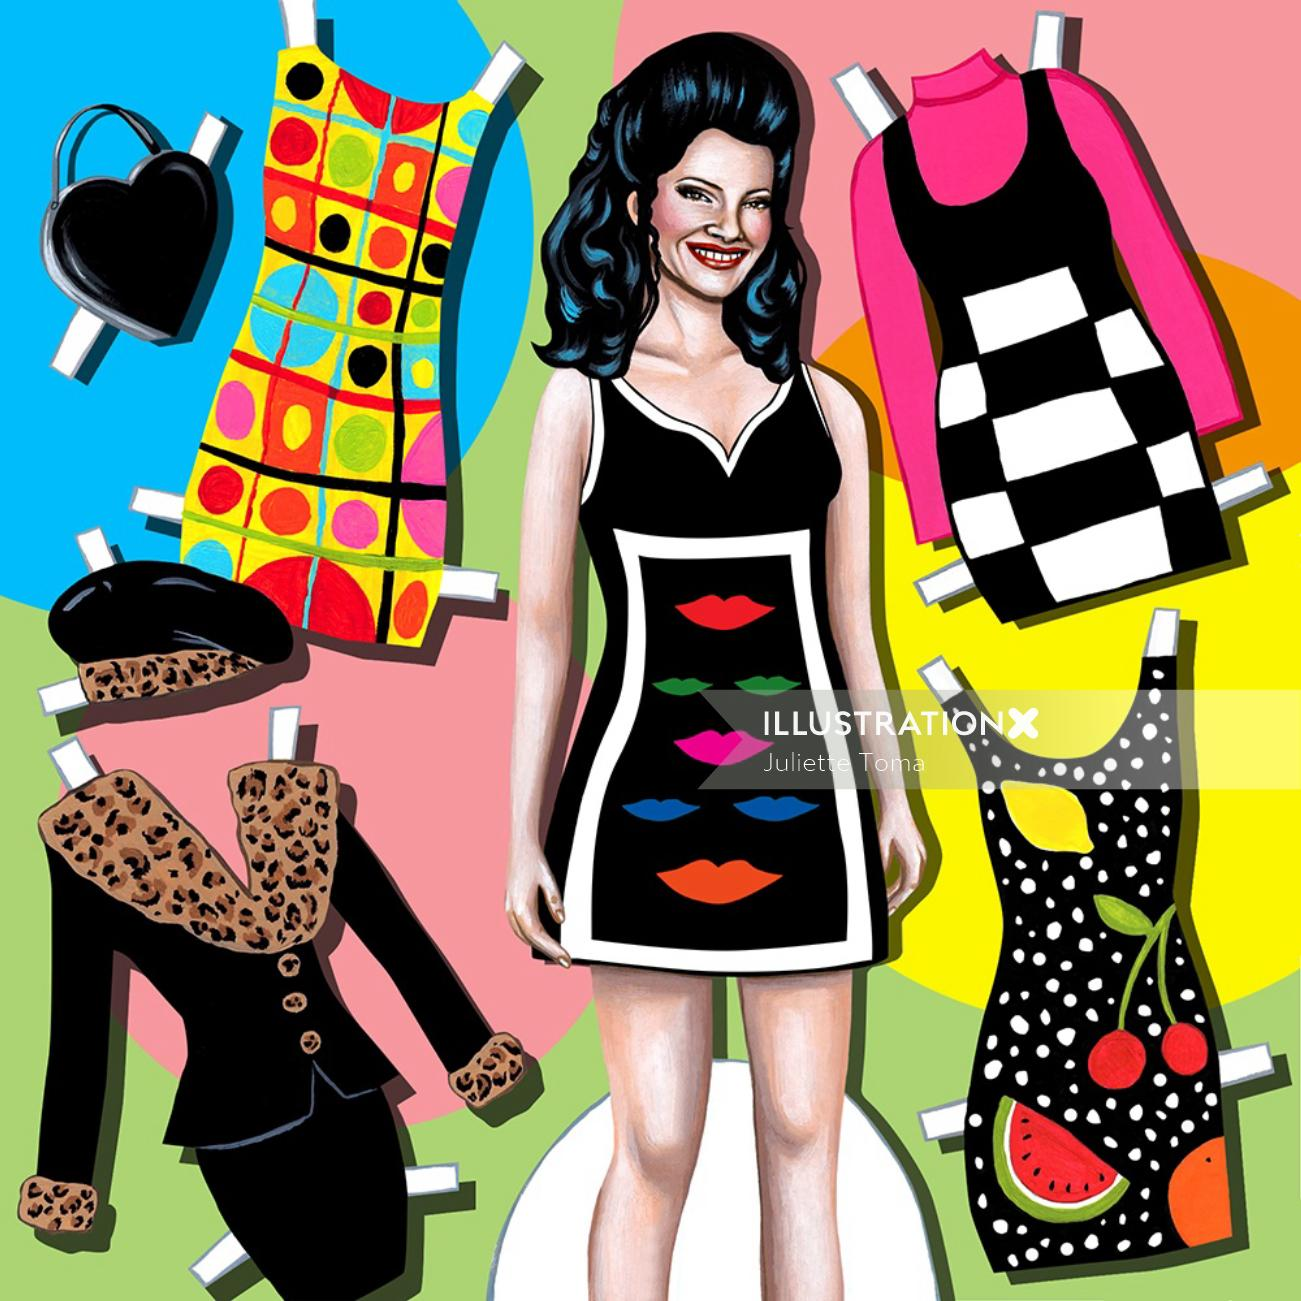 Fashion illustration by Juliette Toma